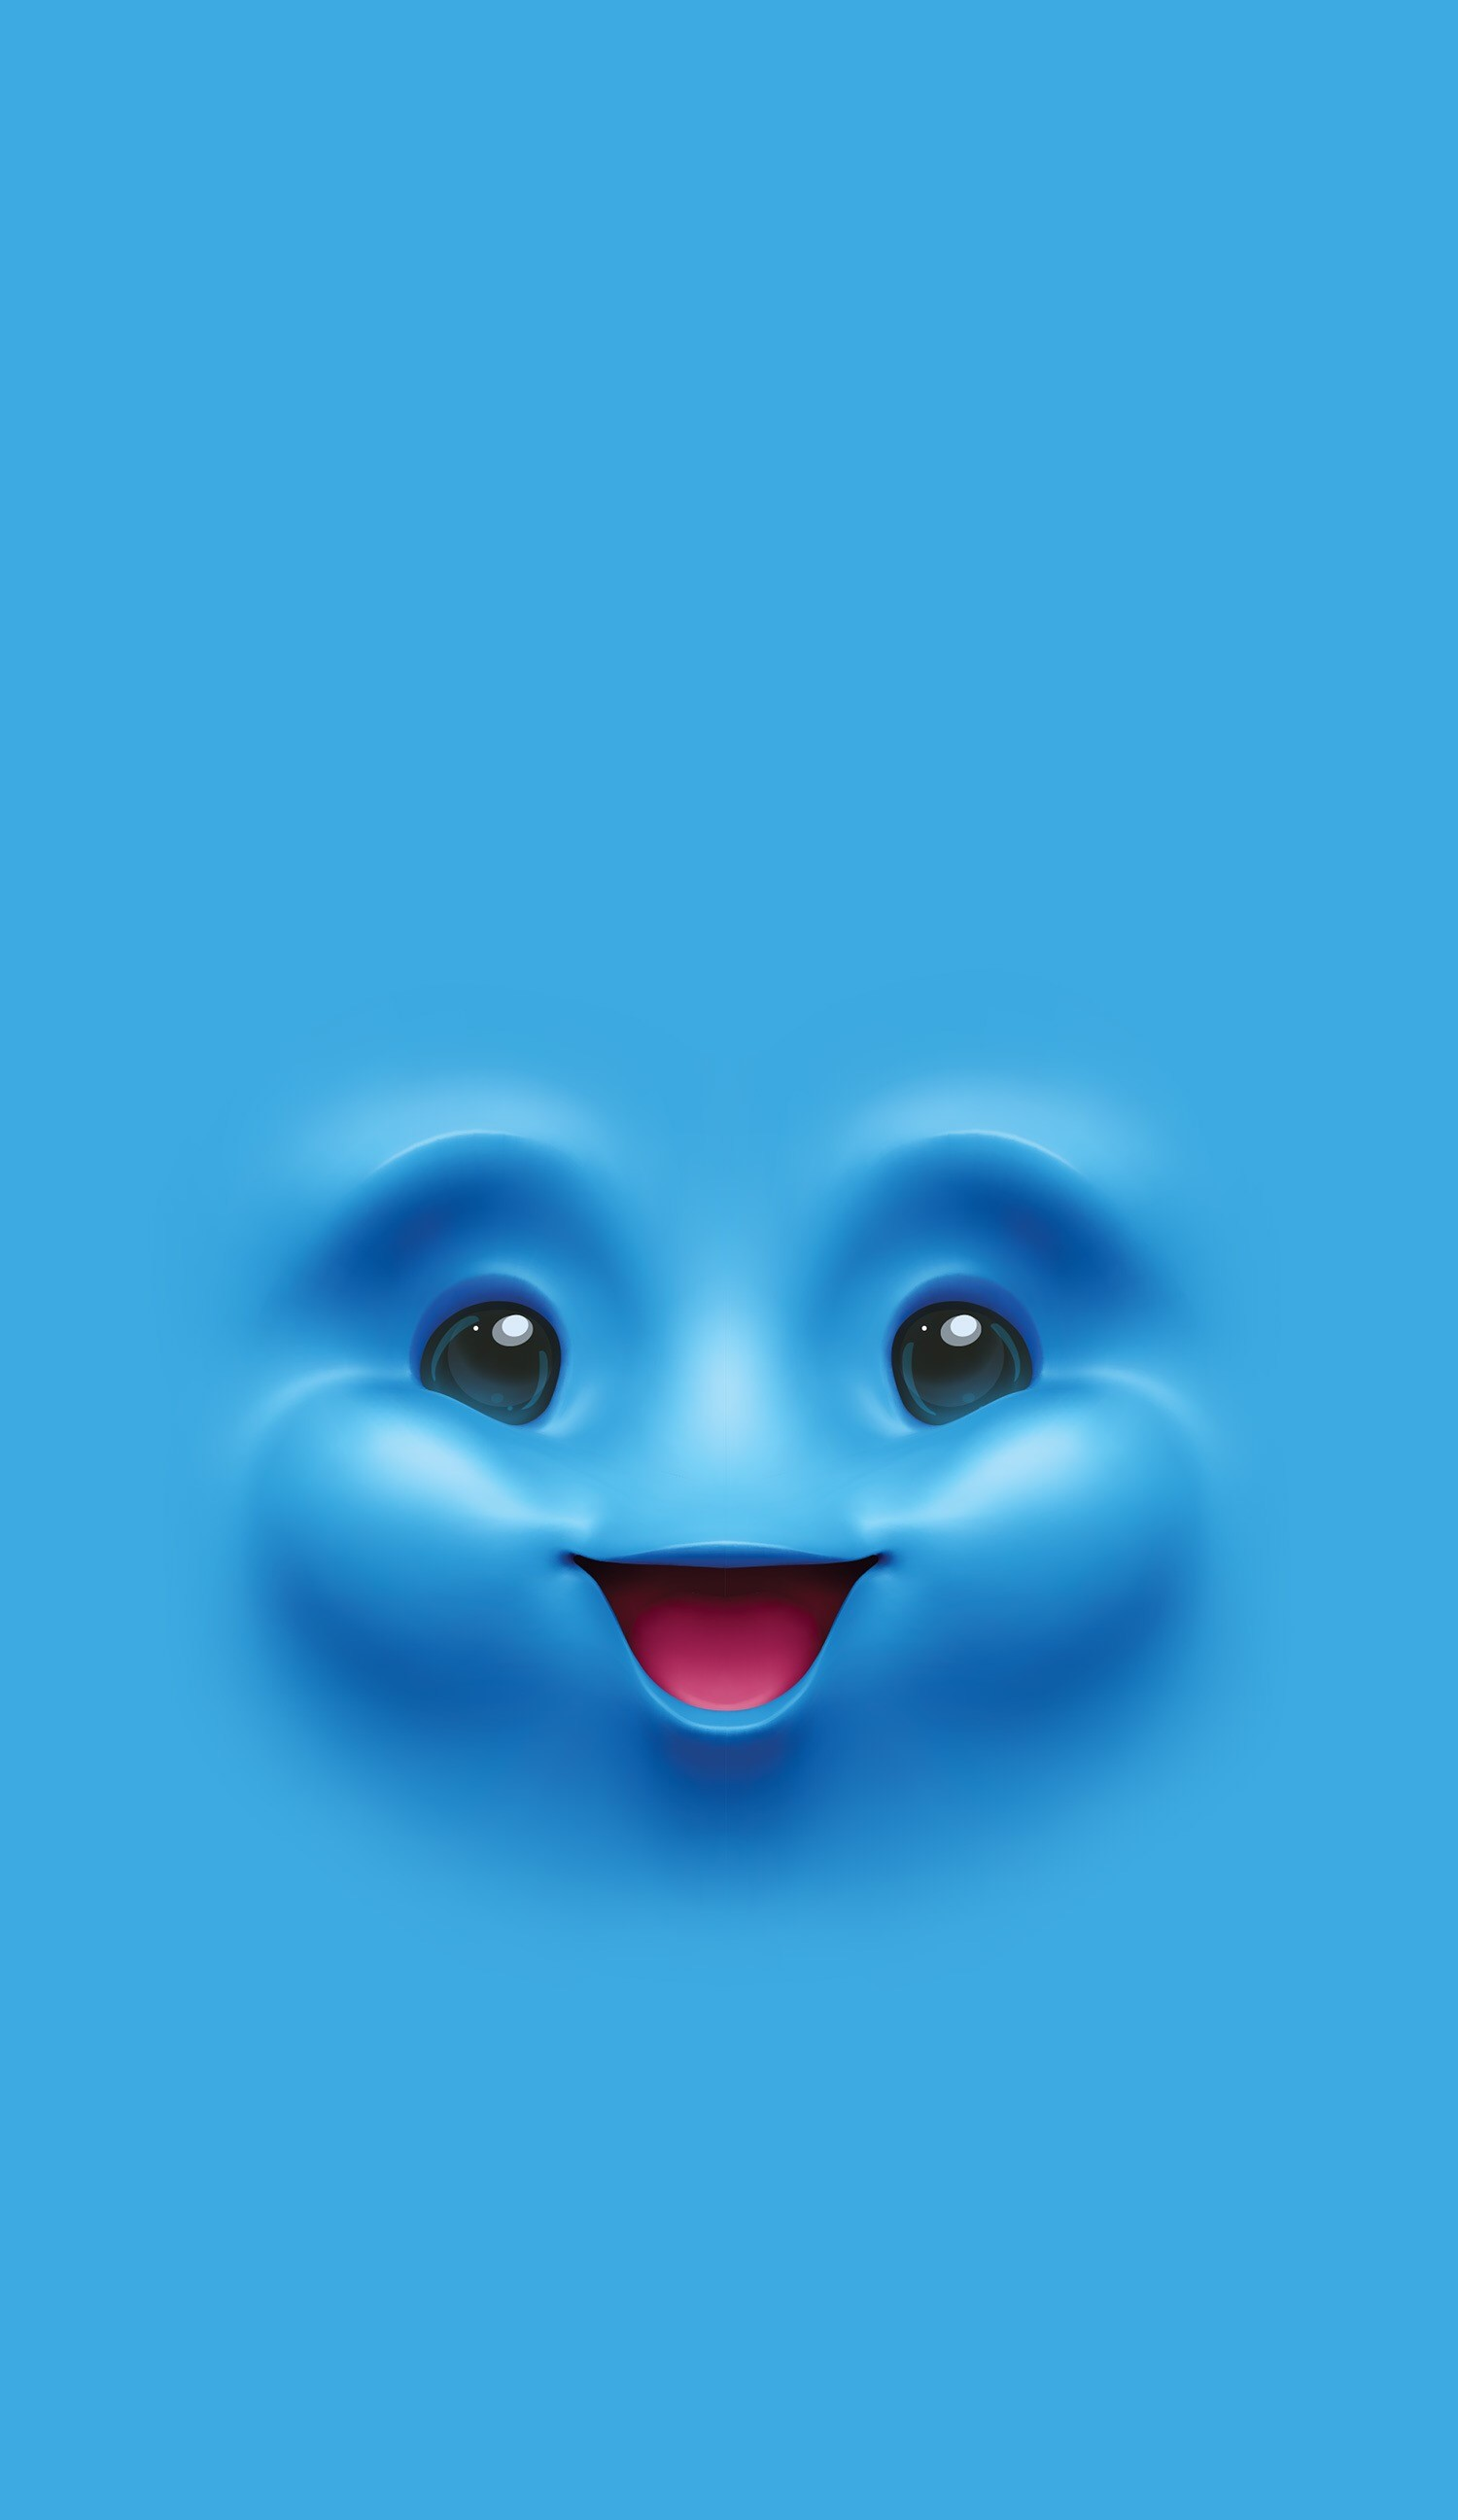 Emoji Wallpapers Girly (61+ images)